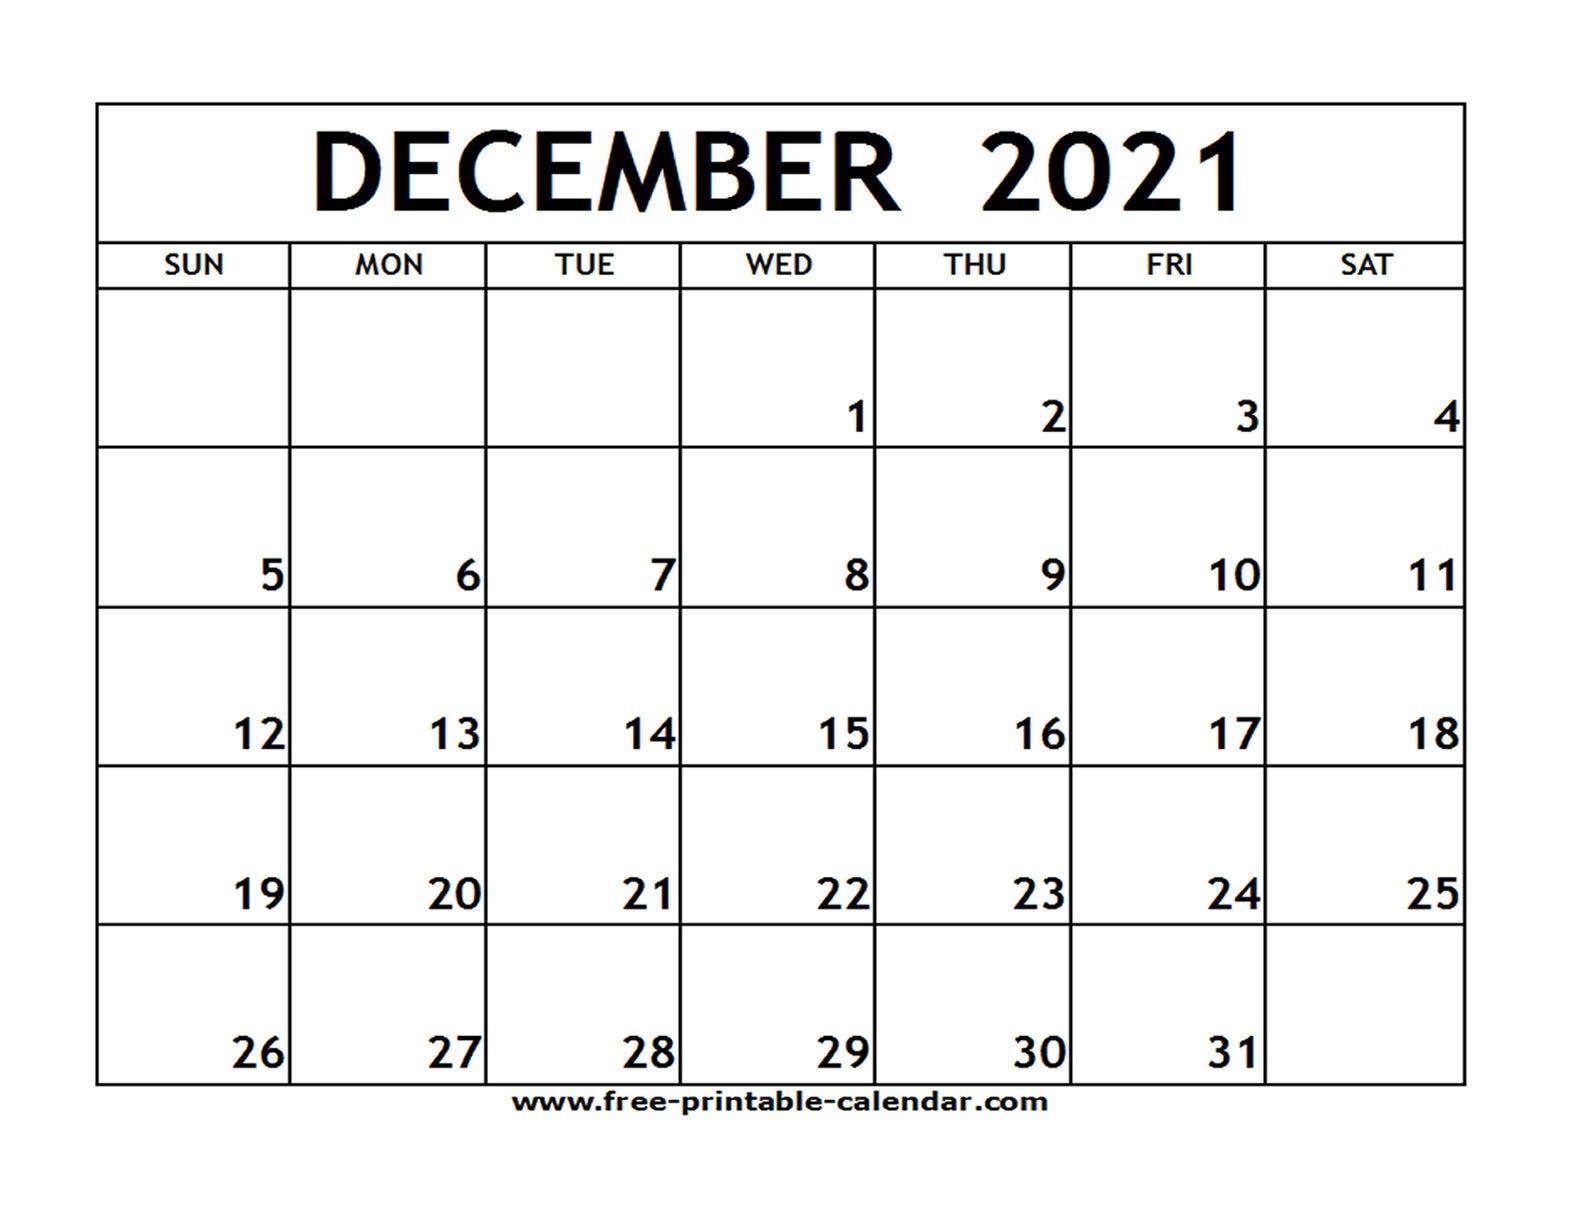 Editable 2021 Free Printable 2021 Calendar With Holidays : List Of Free Printable 2021 Calendar inside Free Printable Planner Pdf 2021 Image